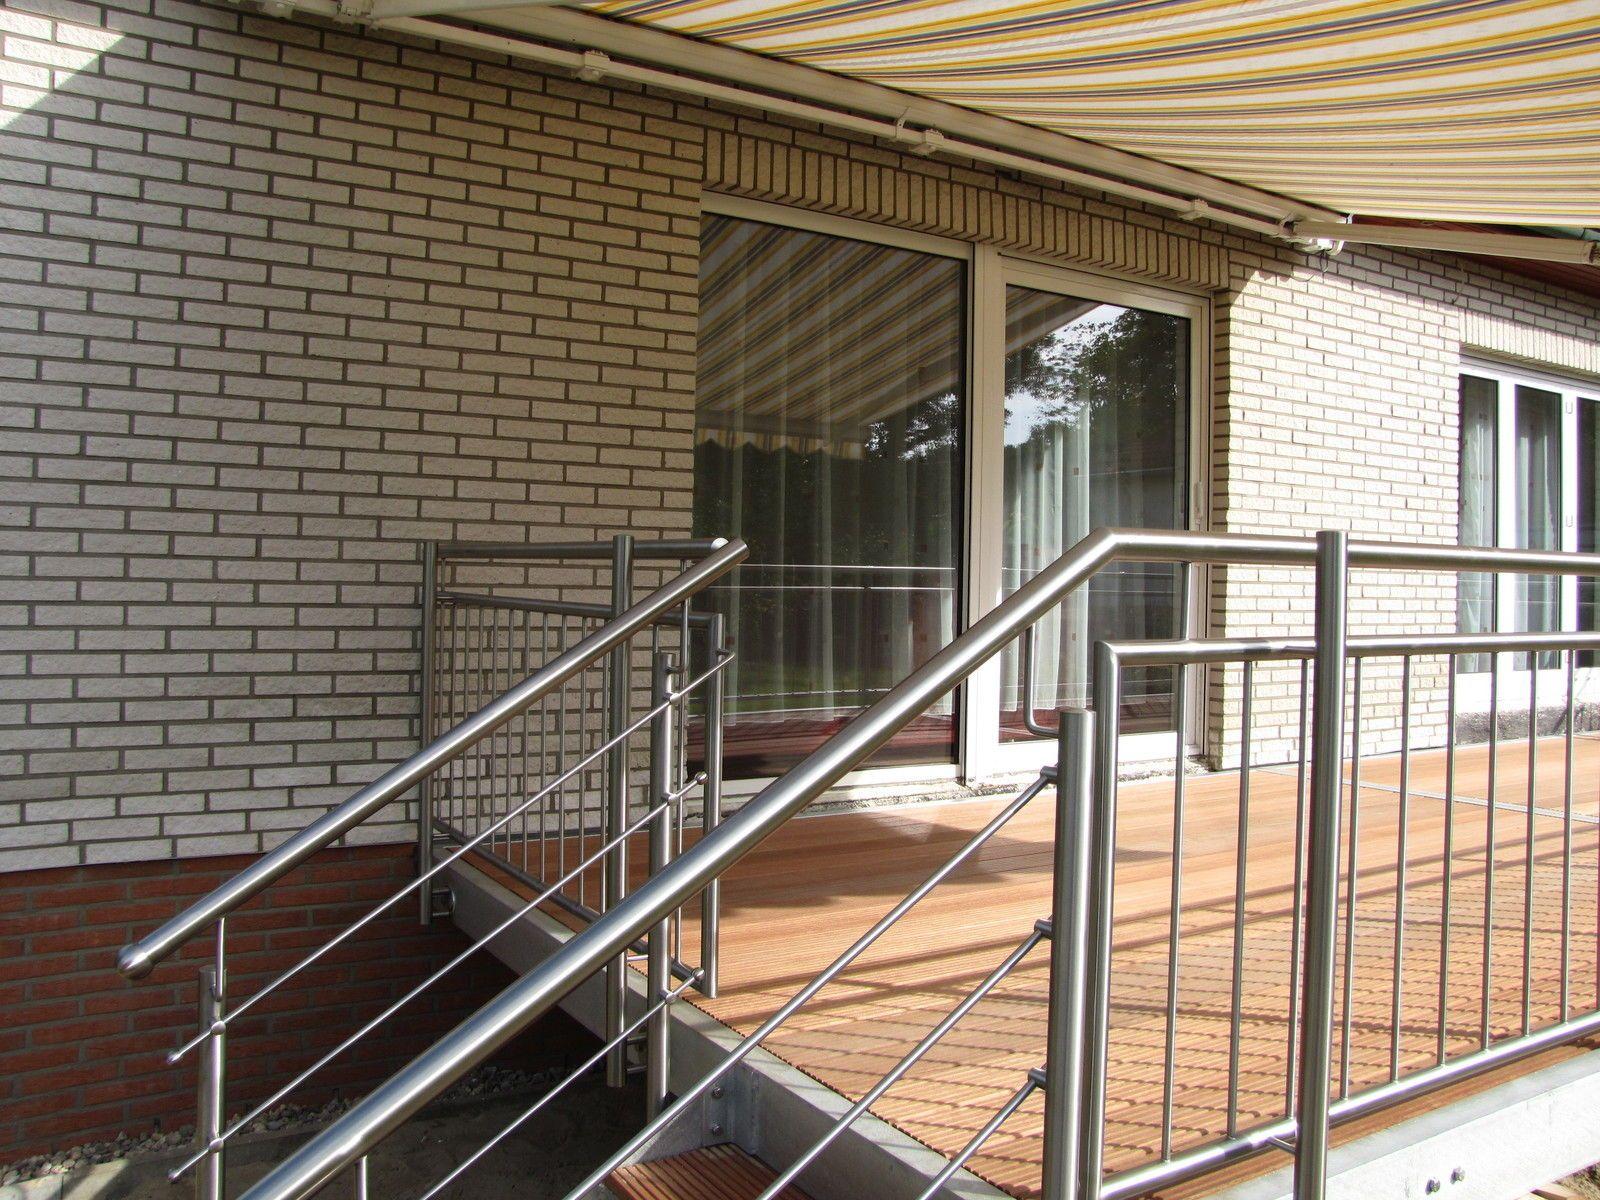 Gut bekannt Terrasse Balkon Anbaubalkon + Wangentreppe Außentreppe verzinkt UH18